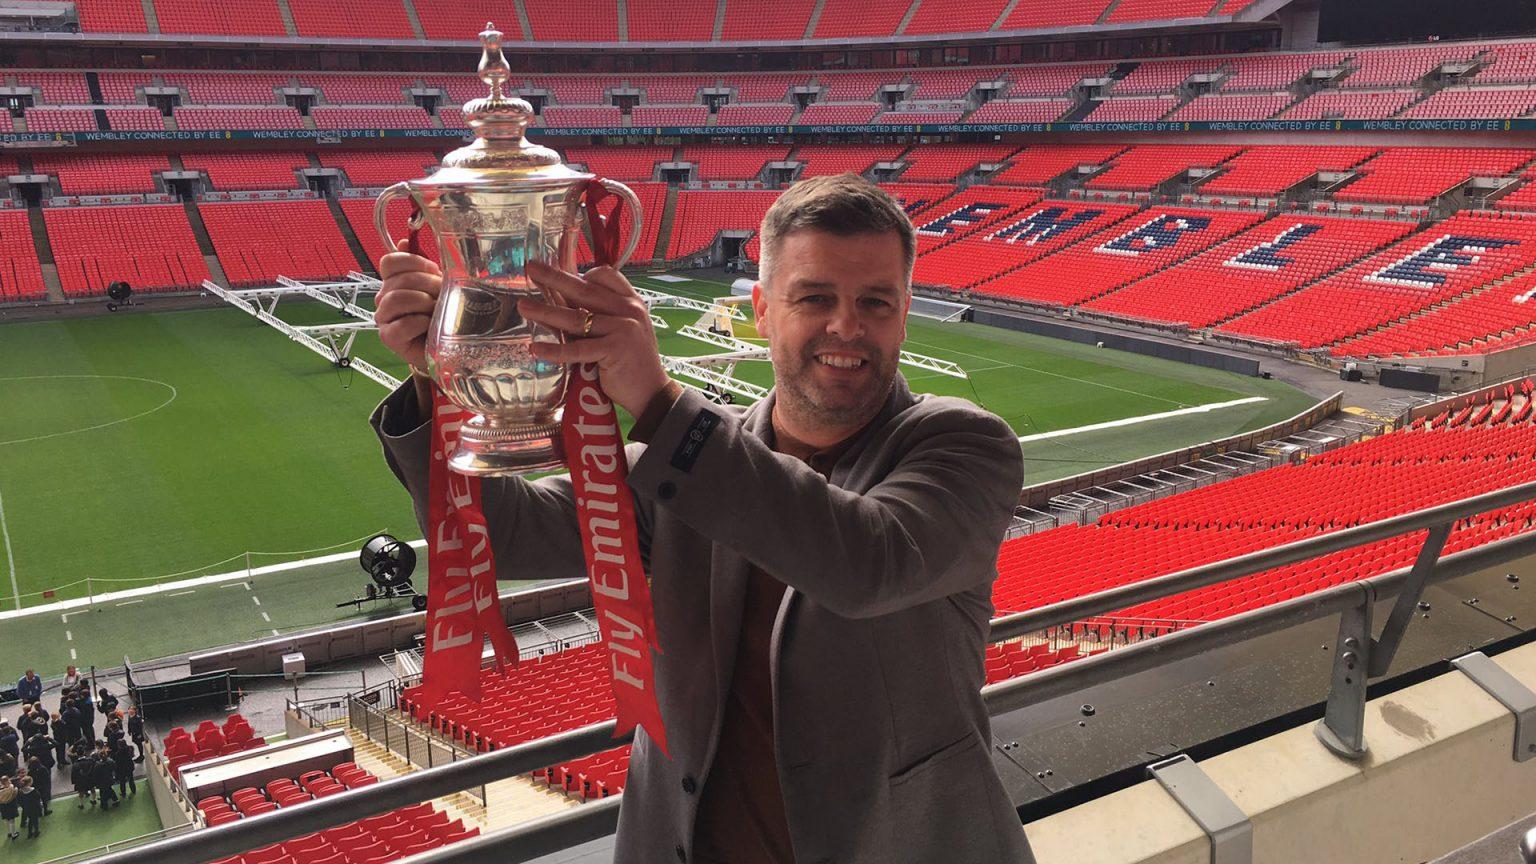 CB_PIC_CARL FA CUP